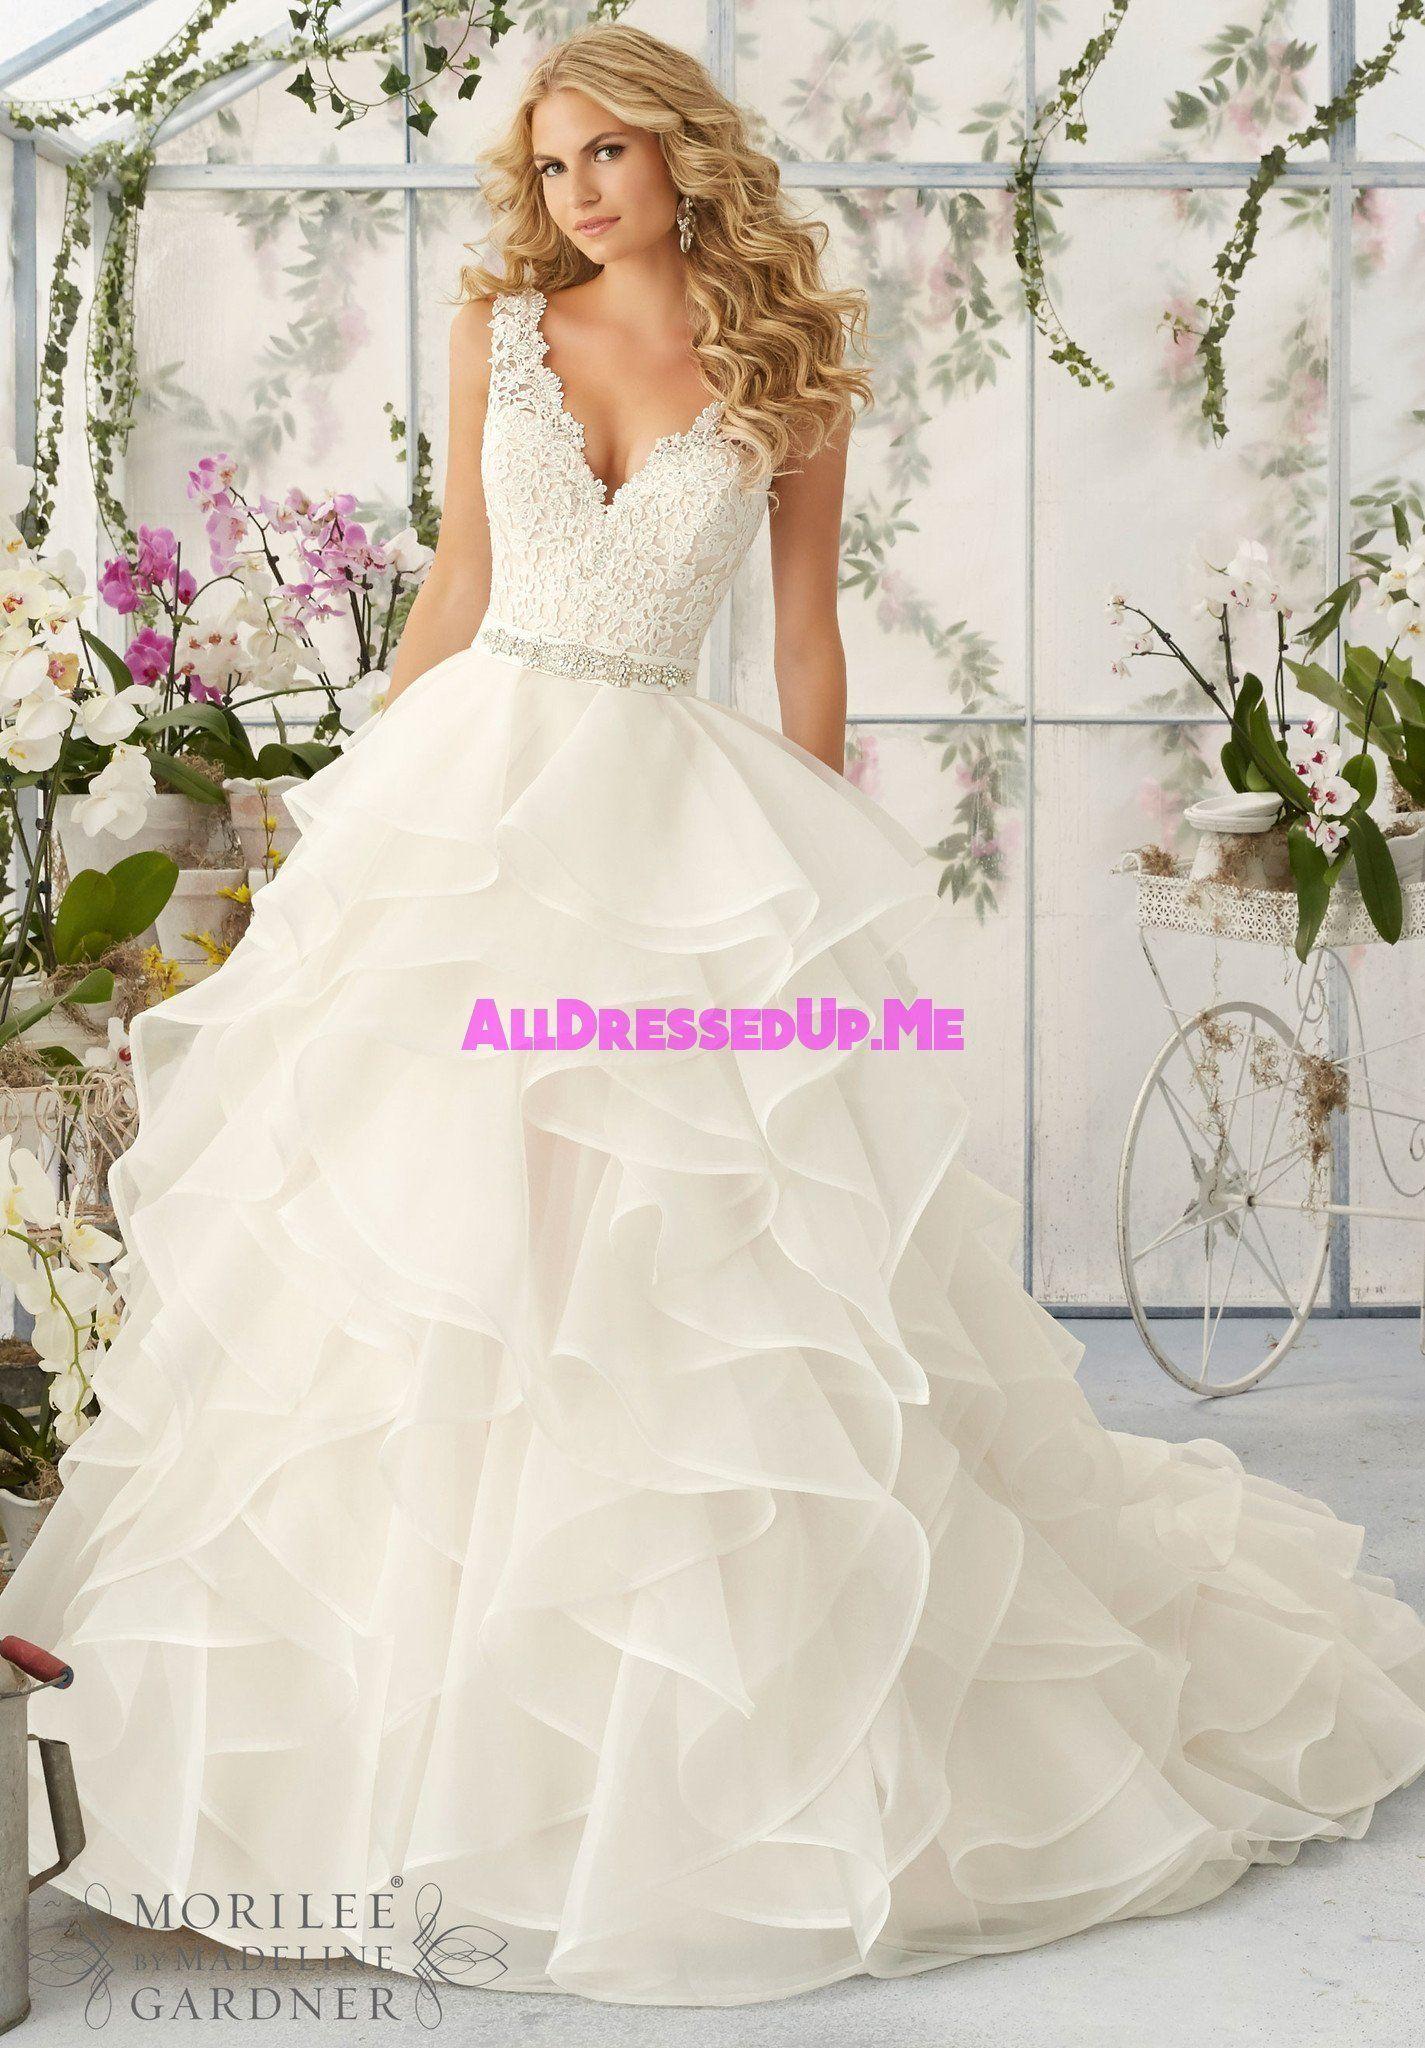 Mori lee gold wedding dress  Mori Lee    All Dressed Up Bridal Gown  Mori lee Bridal